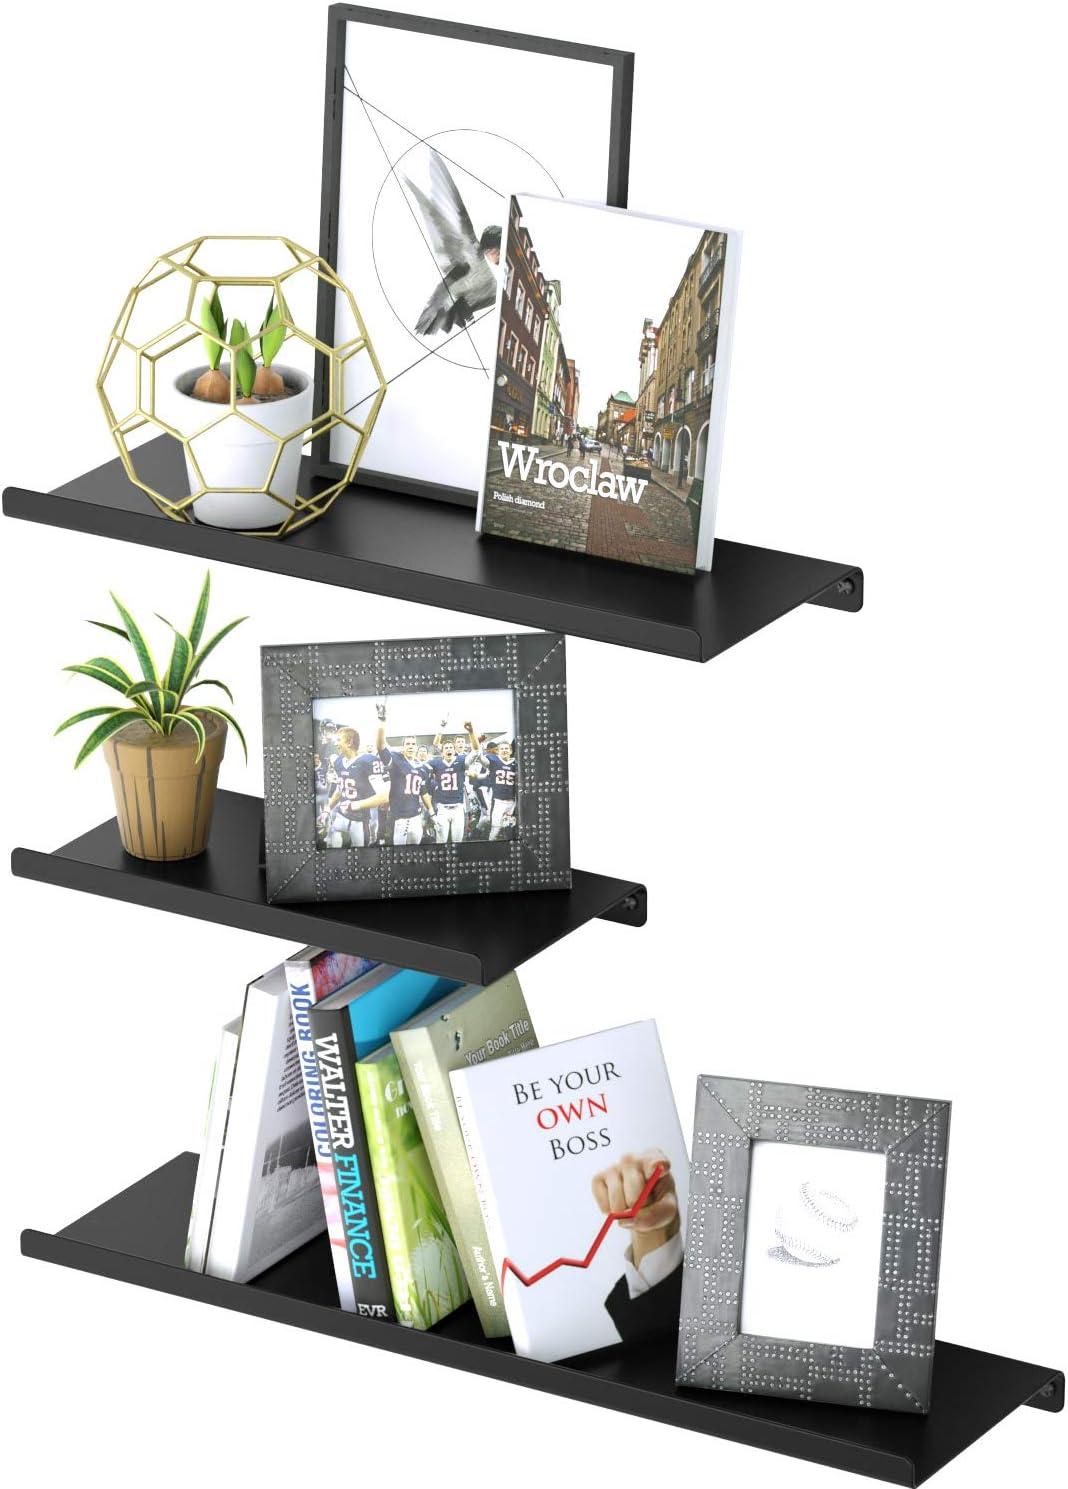 SRIWATANA Floating Shelves Set Wall Mounted Metal Shelves Space Saving Shelf to Hold up 33 lbs Shelves Set of 3 White